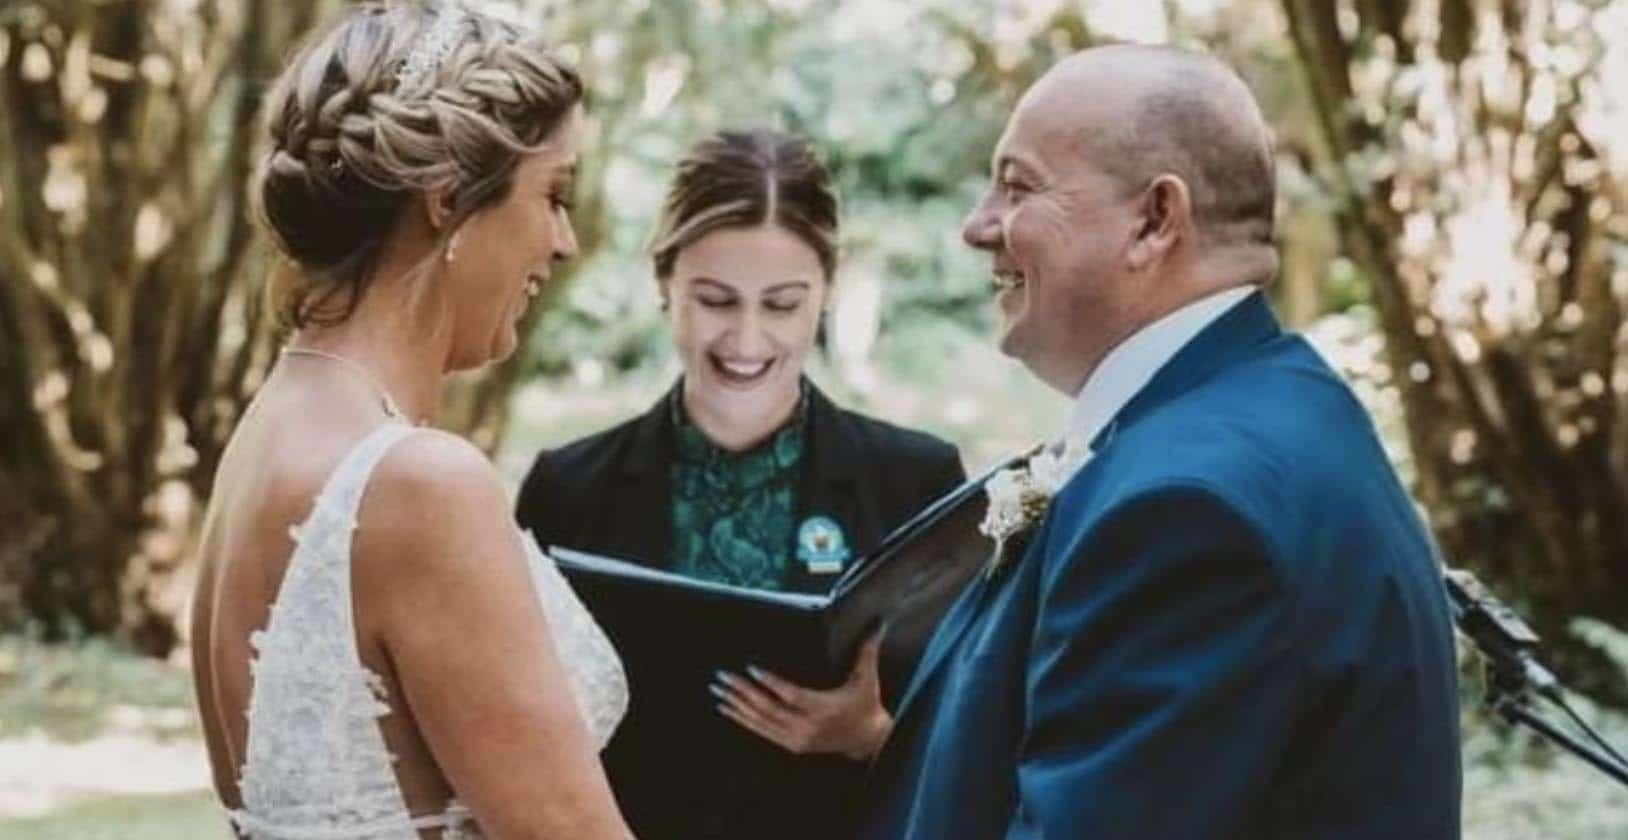 spiritual ceremonies wedding celebrants testimonial 2 ireland